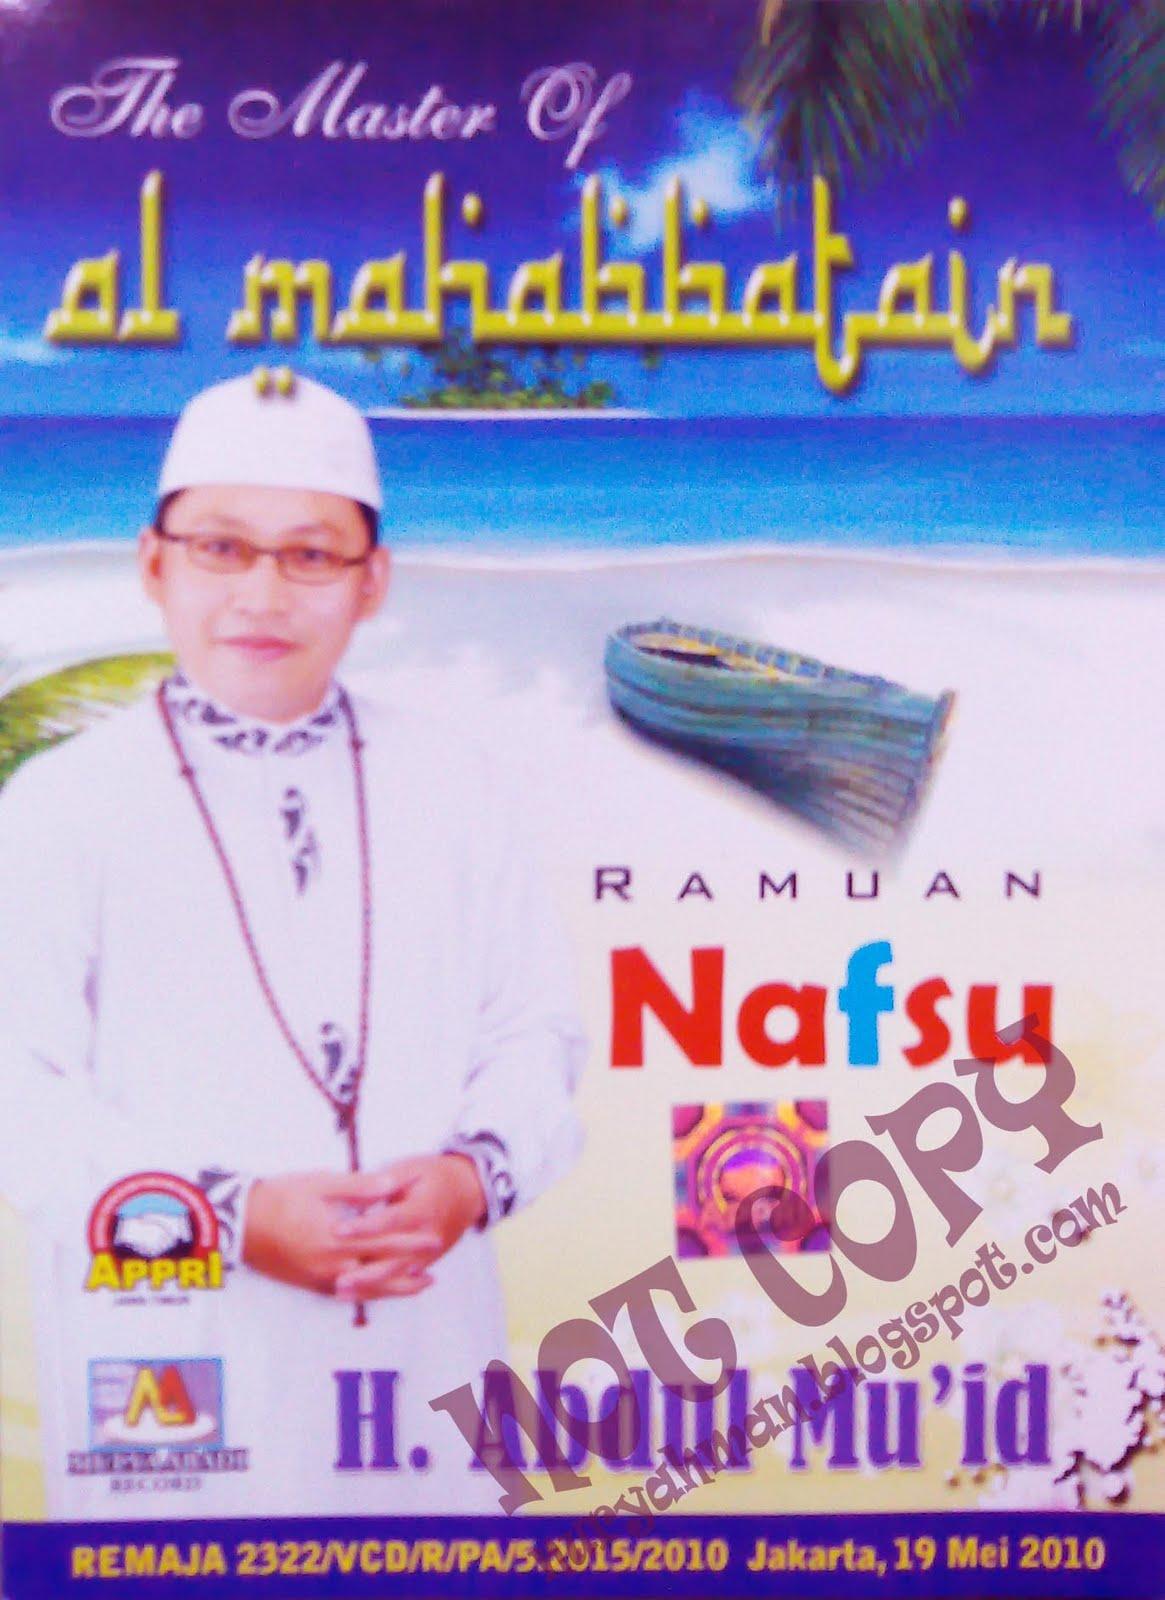 Free Download Lagu Terbaru Indonesia Barat Arab India Dll